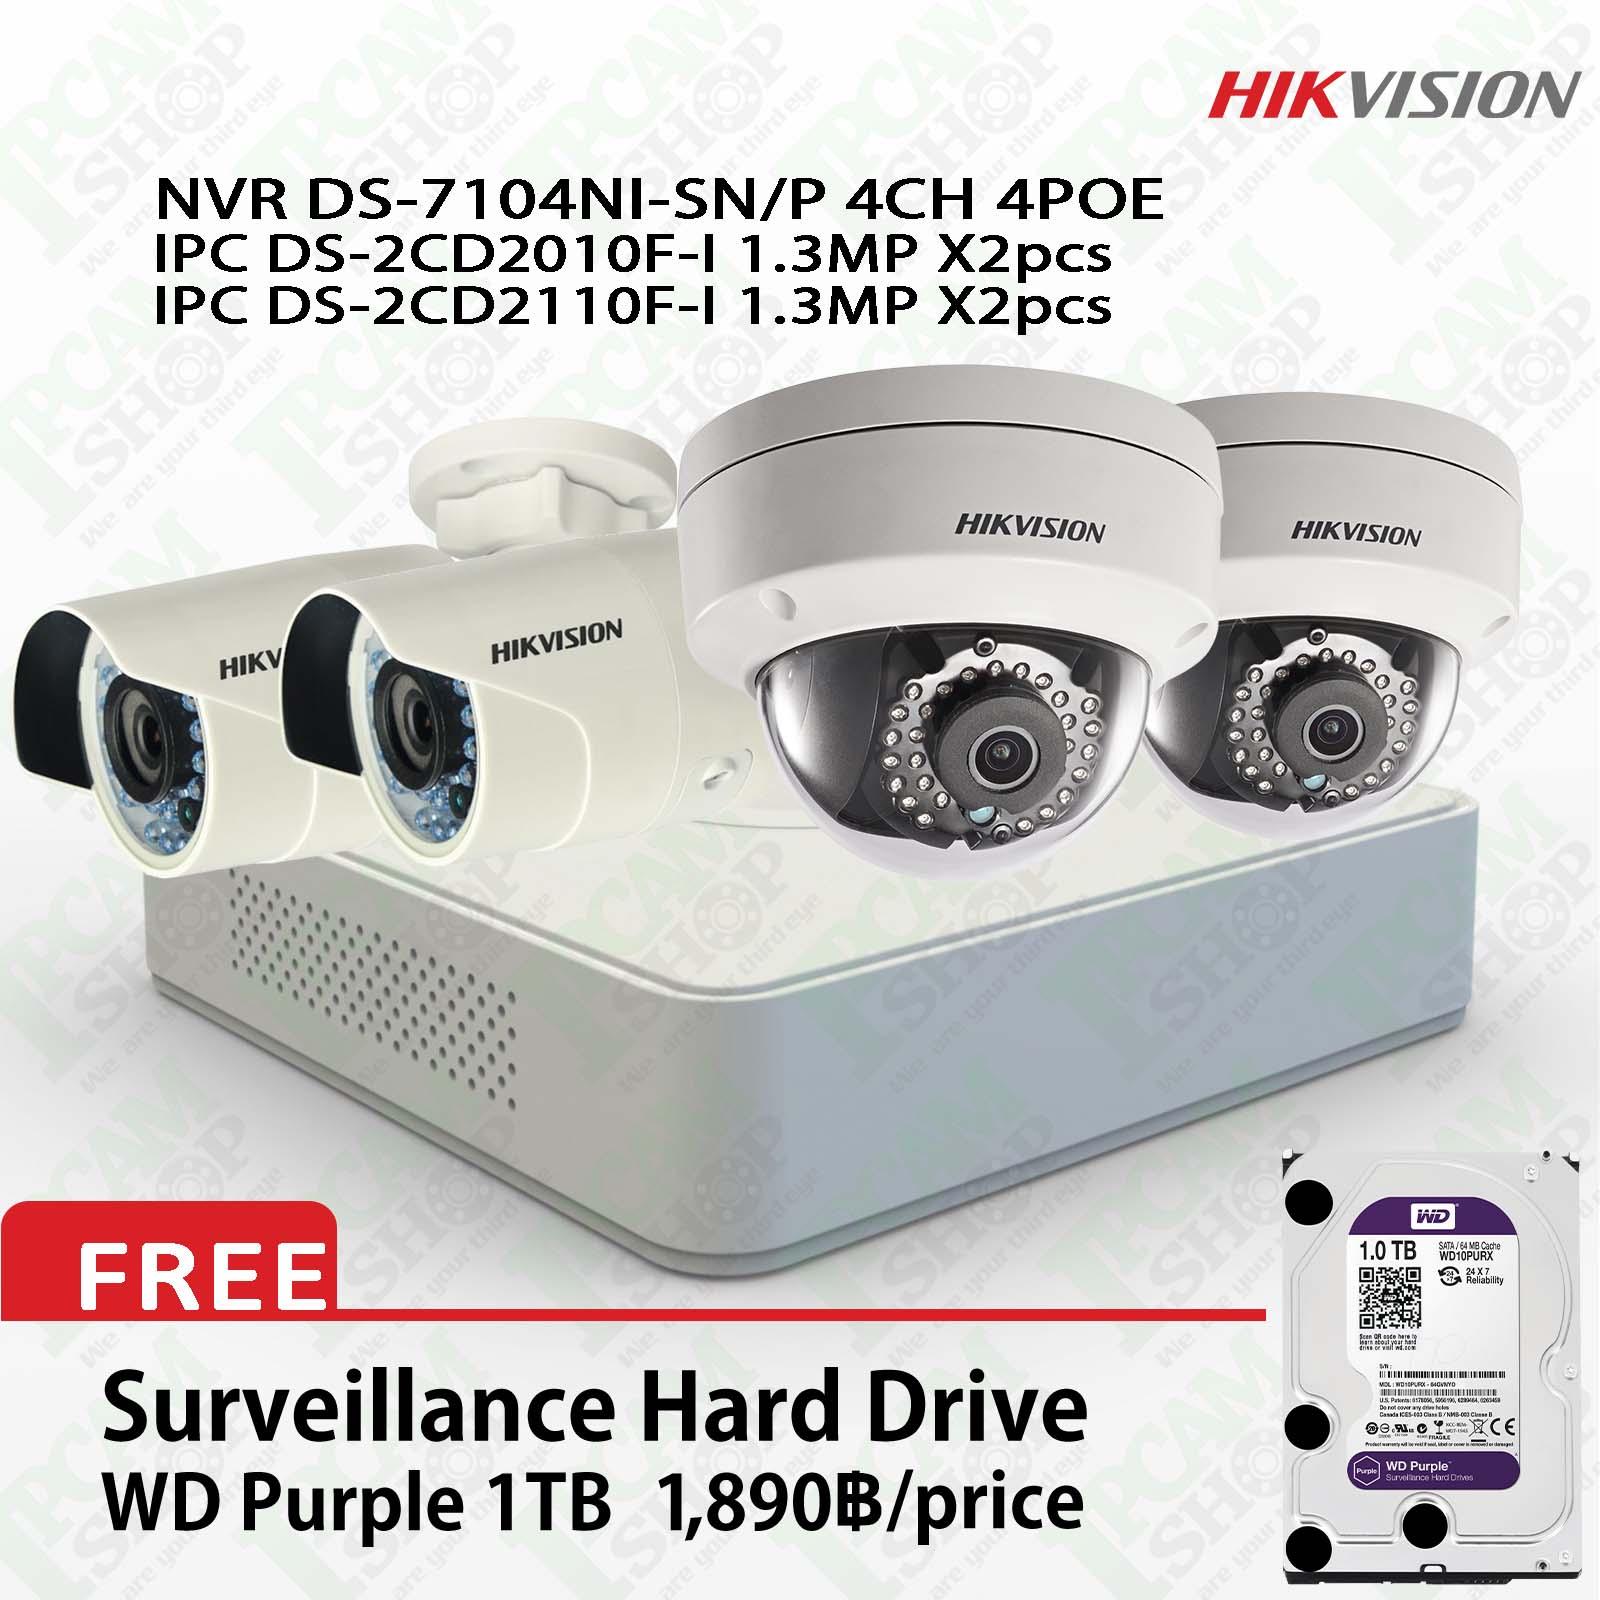 Hikvision POE Kit DS-7104NI-SN/P, DS-2CD2010F-Ix2, DS-2CD2110F-Ix2